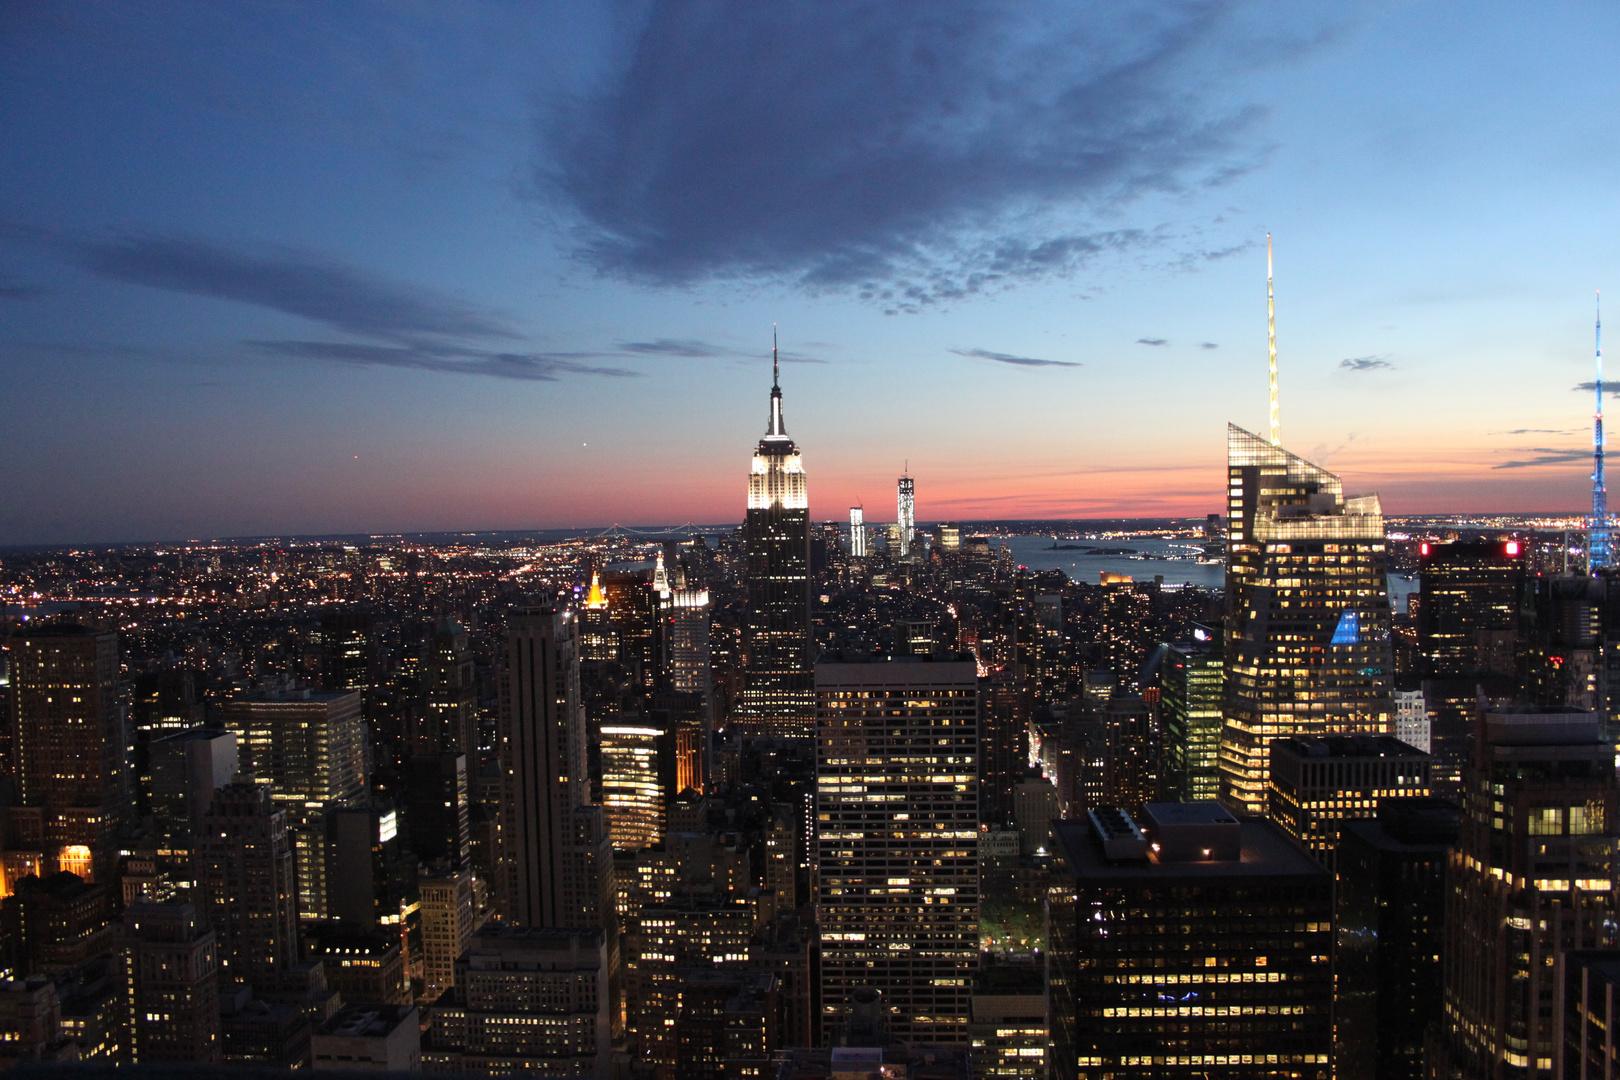 New York City am Abend